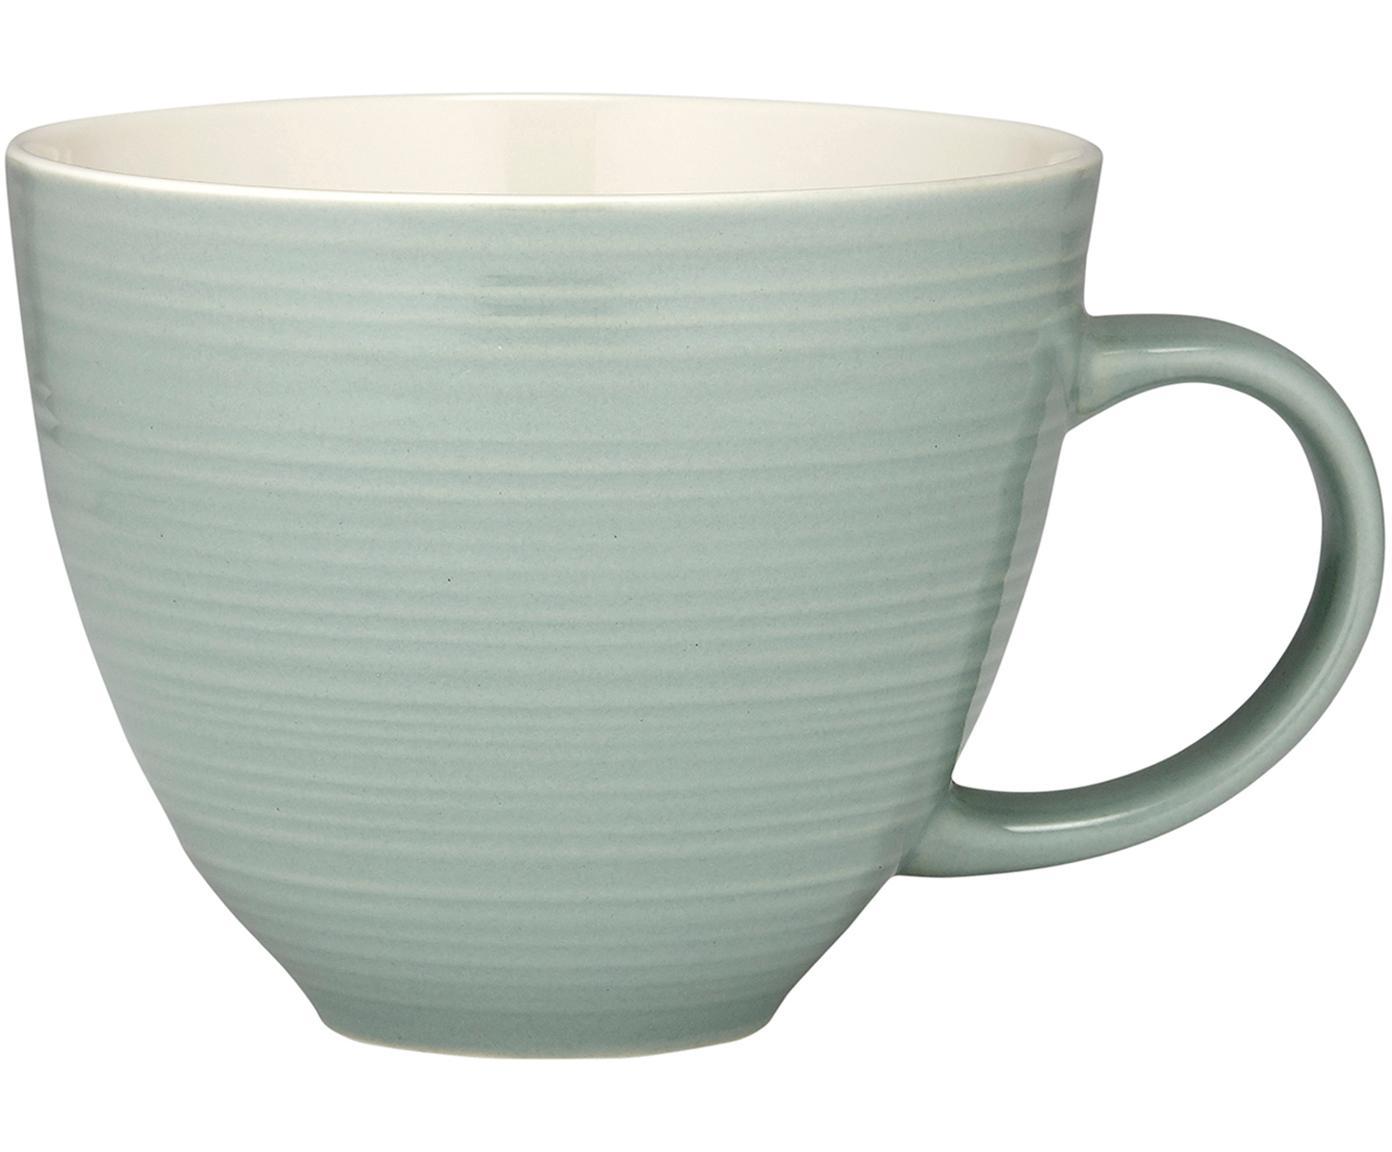 Koffiekopjes Darby, 4 stuks, New Bone China, Groen, gebroken wit, Ø 24 x H 11 cm